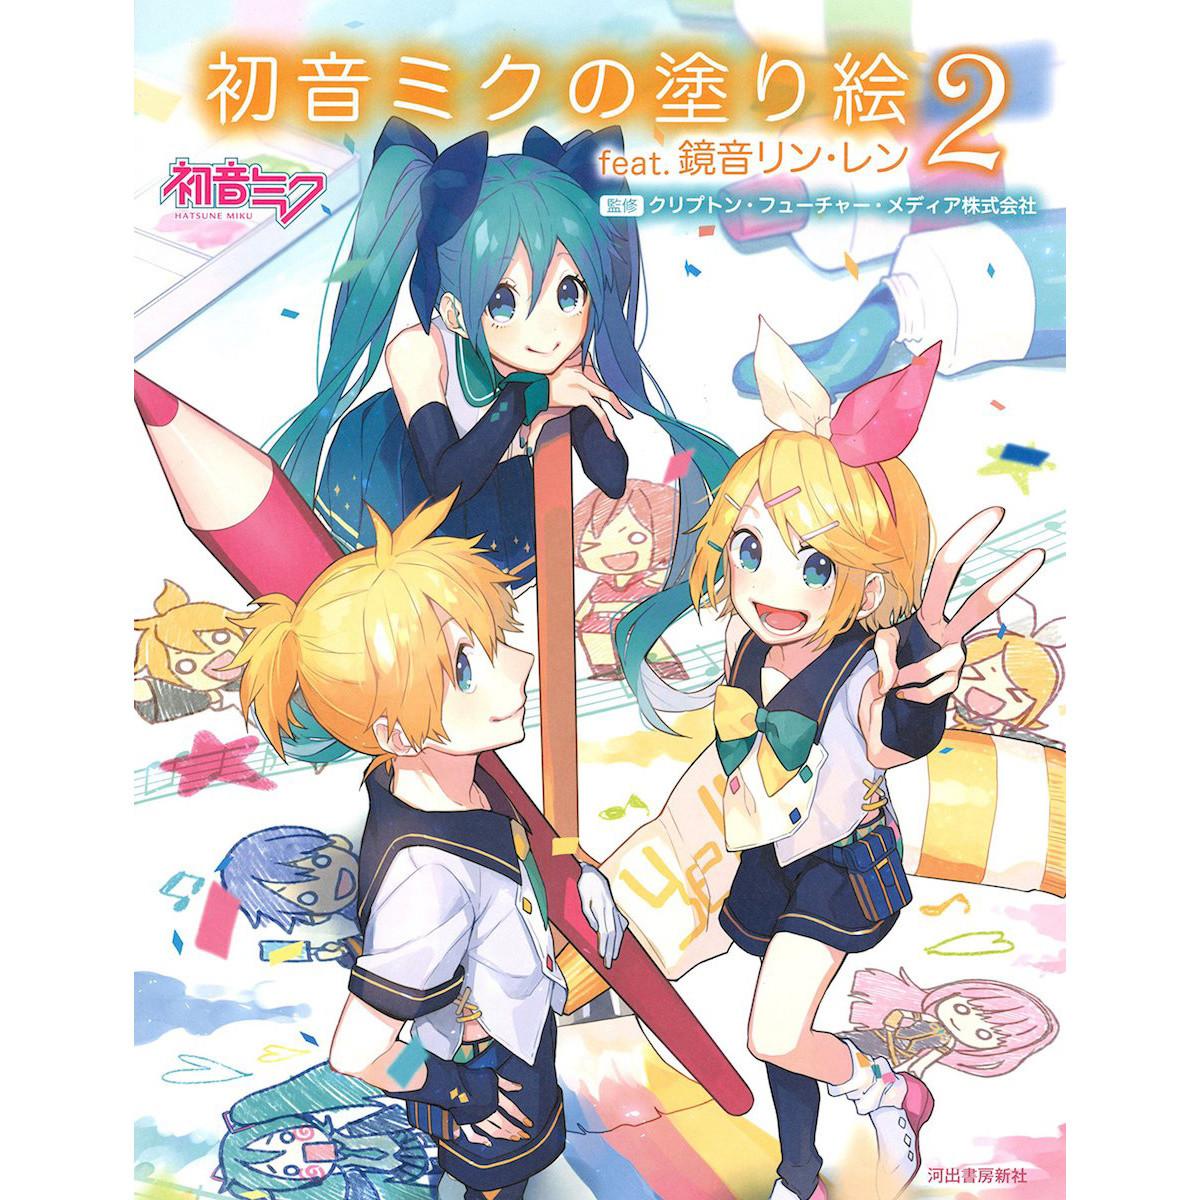 hatsune miku coloring book vol 2 feat kagamine rin len